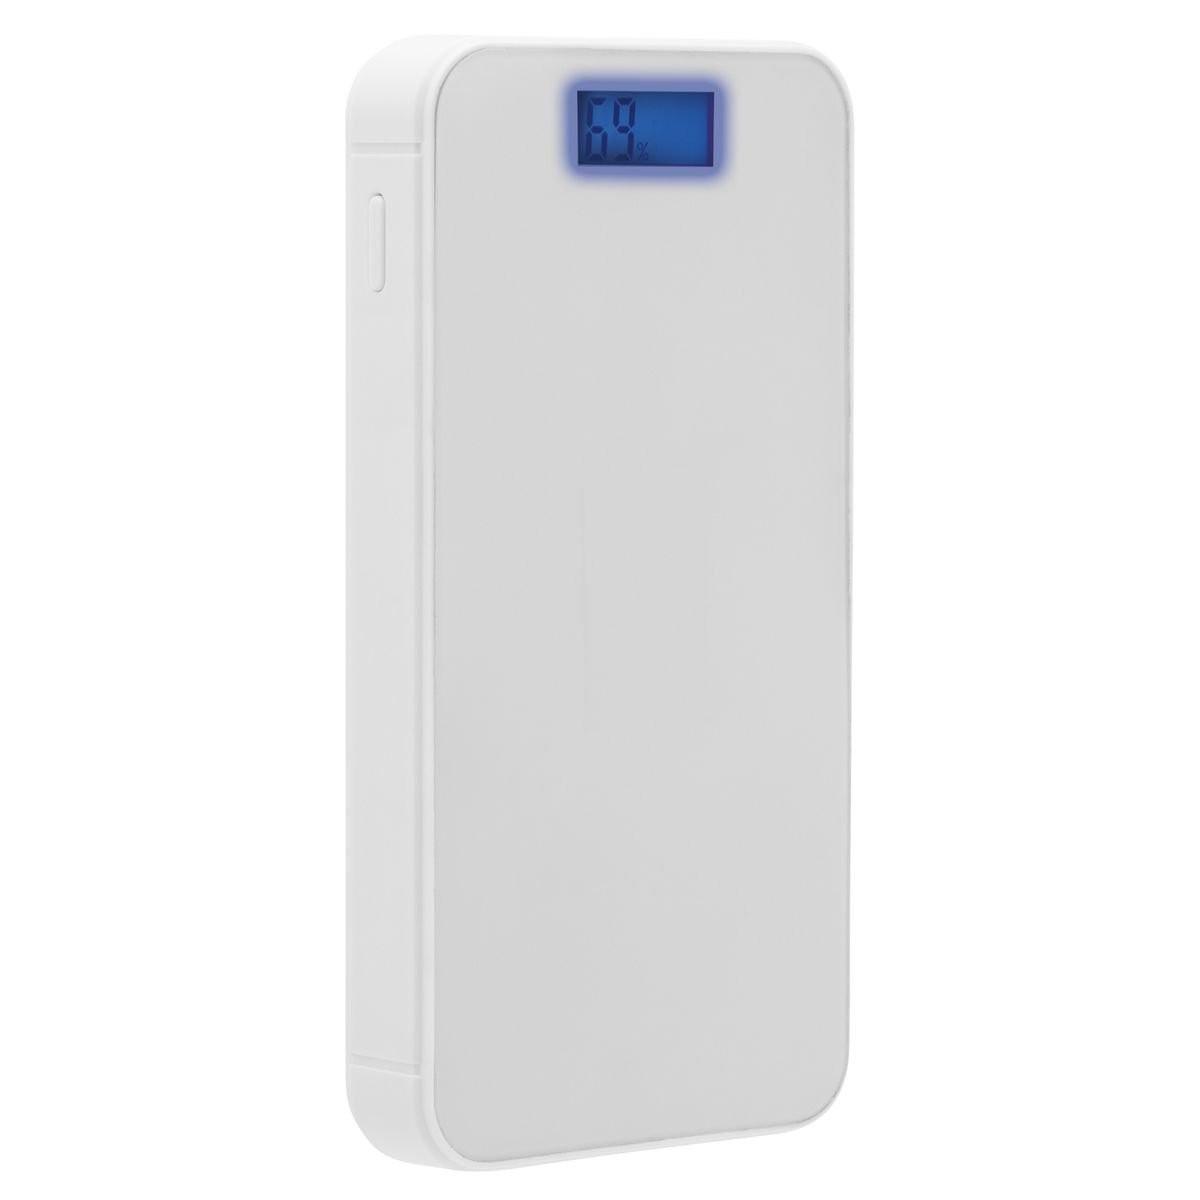 Quick charge Powerbank REFLECTS-CELAYA WHITE, Ansicht 3